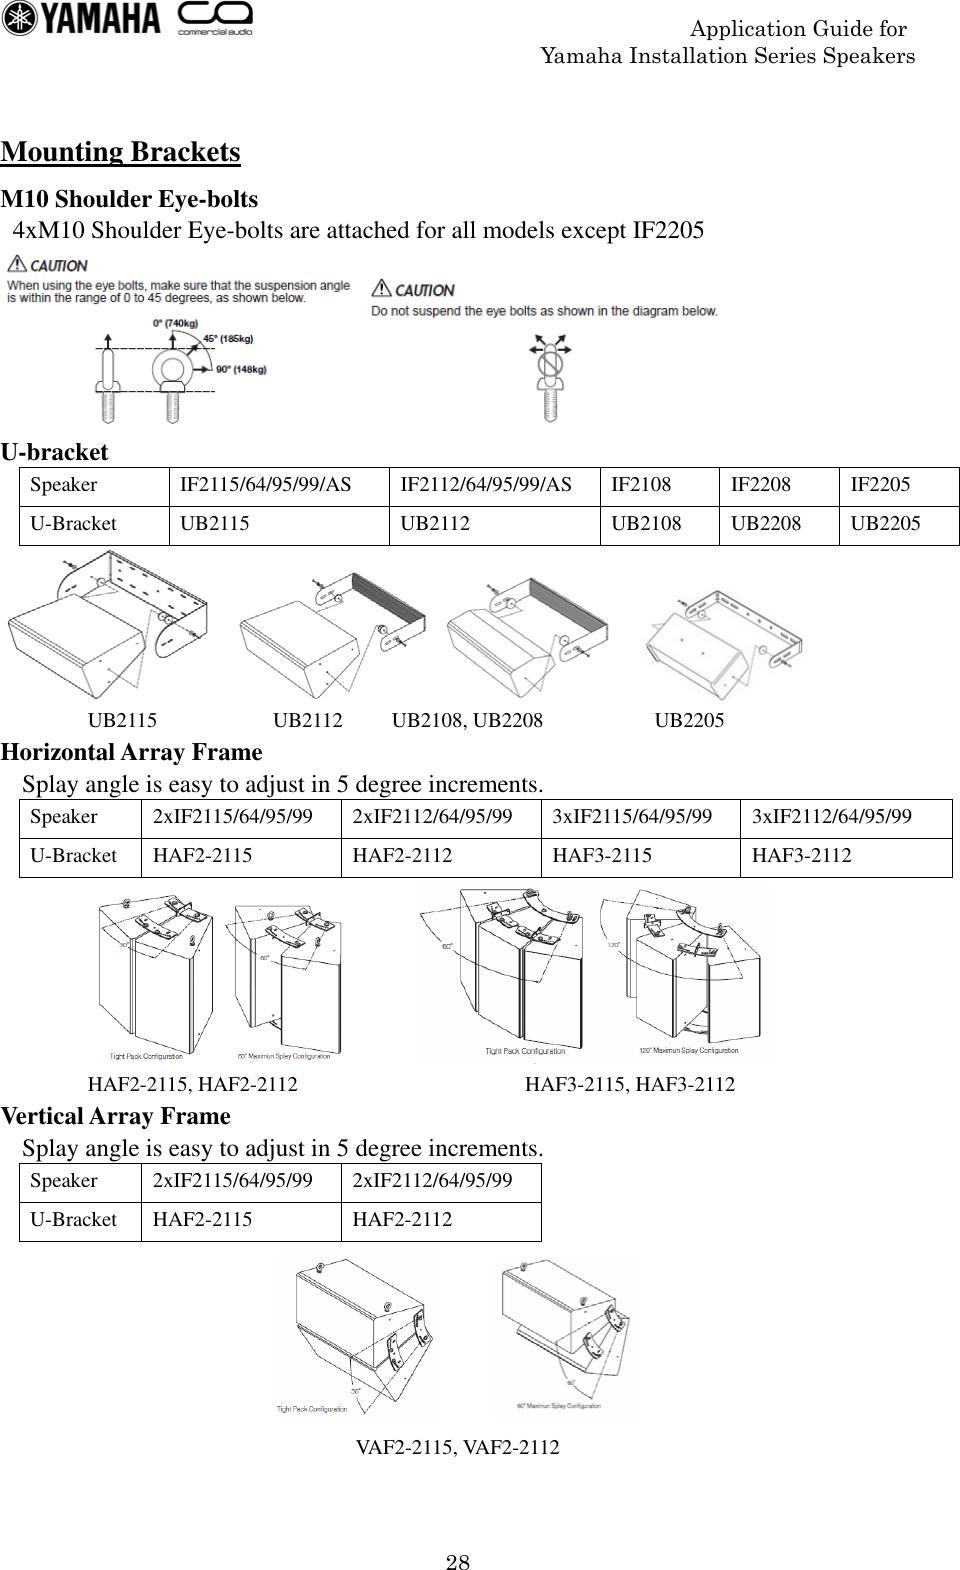 Yamaha Series Speaker Application Guide